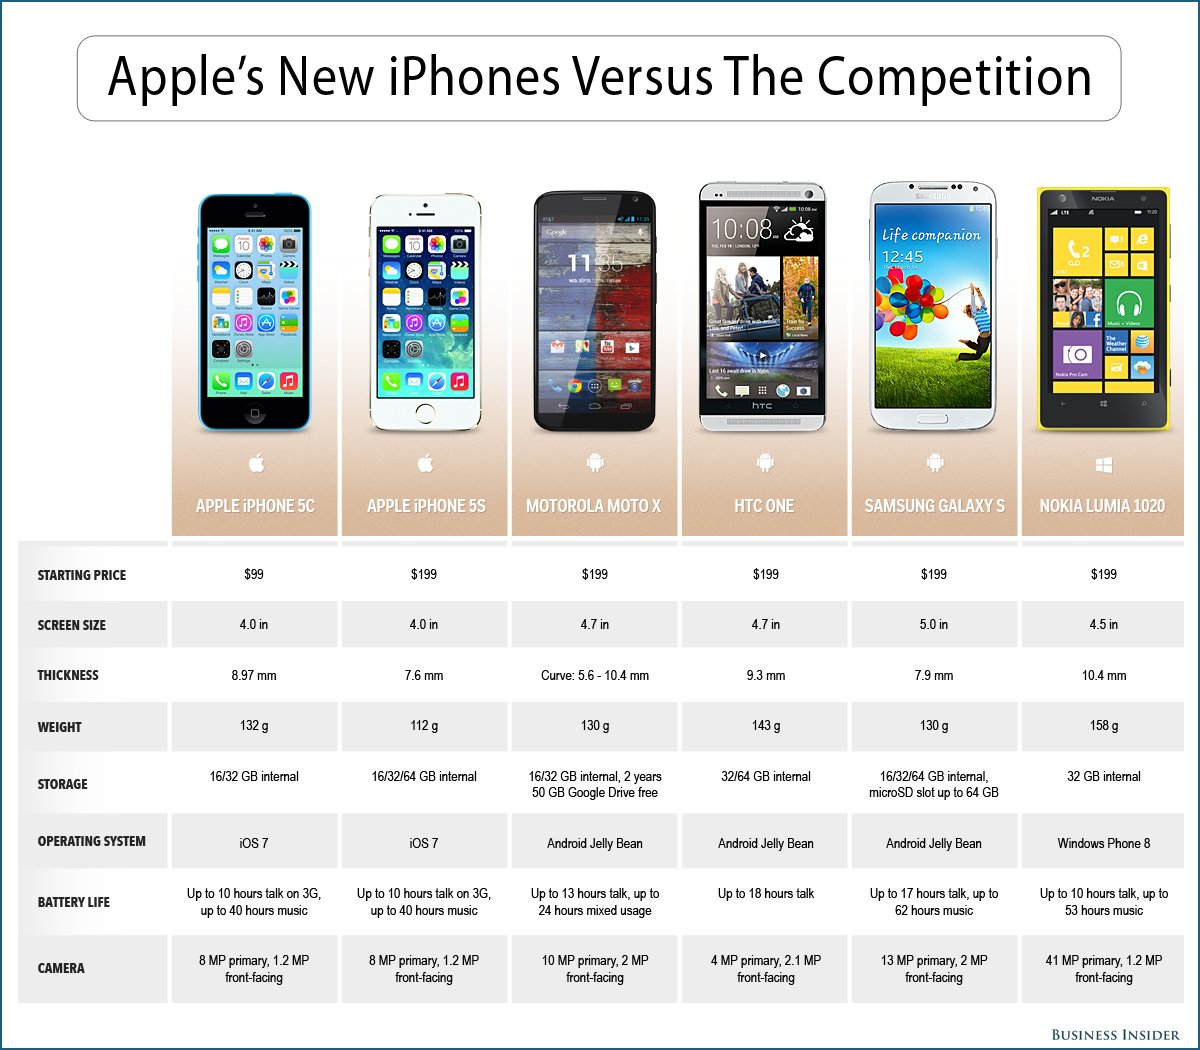 Xperia Z Vs Galaxy S4 Vs Iphone 5 iPhone 5S vs Samsung G...